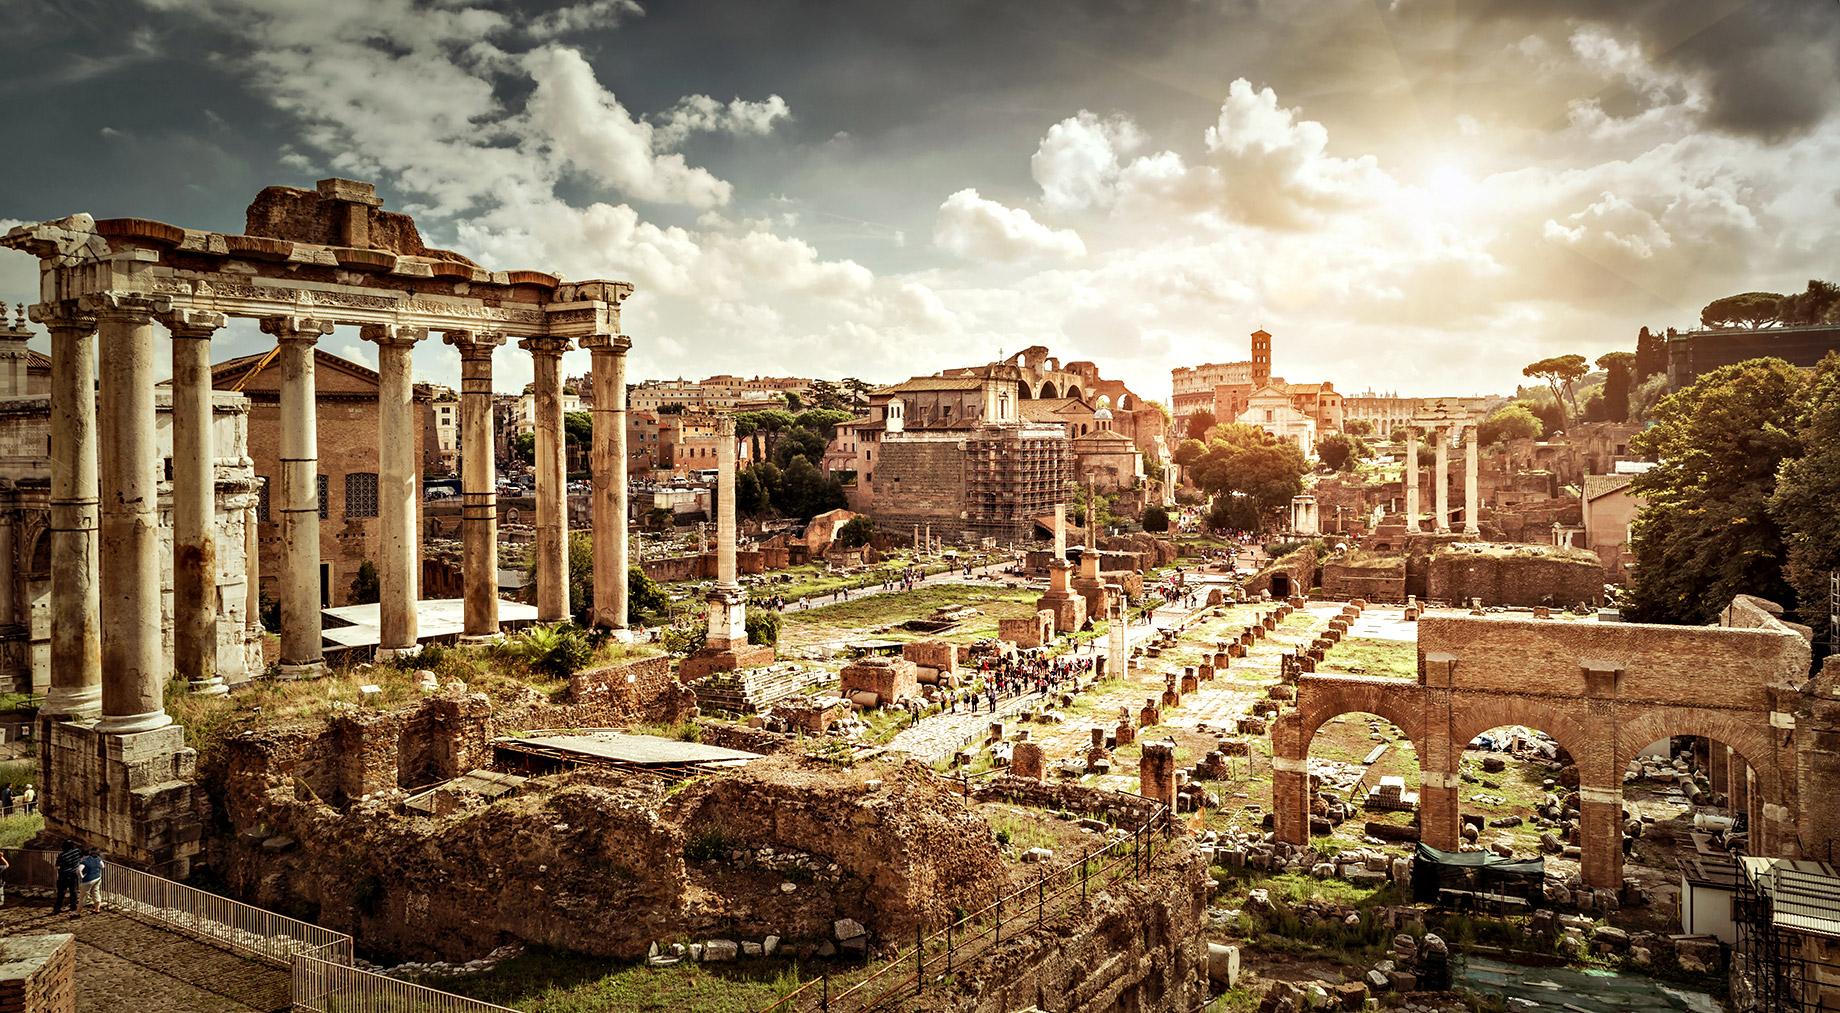 Roman Forum - Rome, Italy - Top 10 Luxury Travel Destinations Around the World